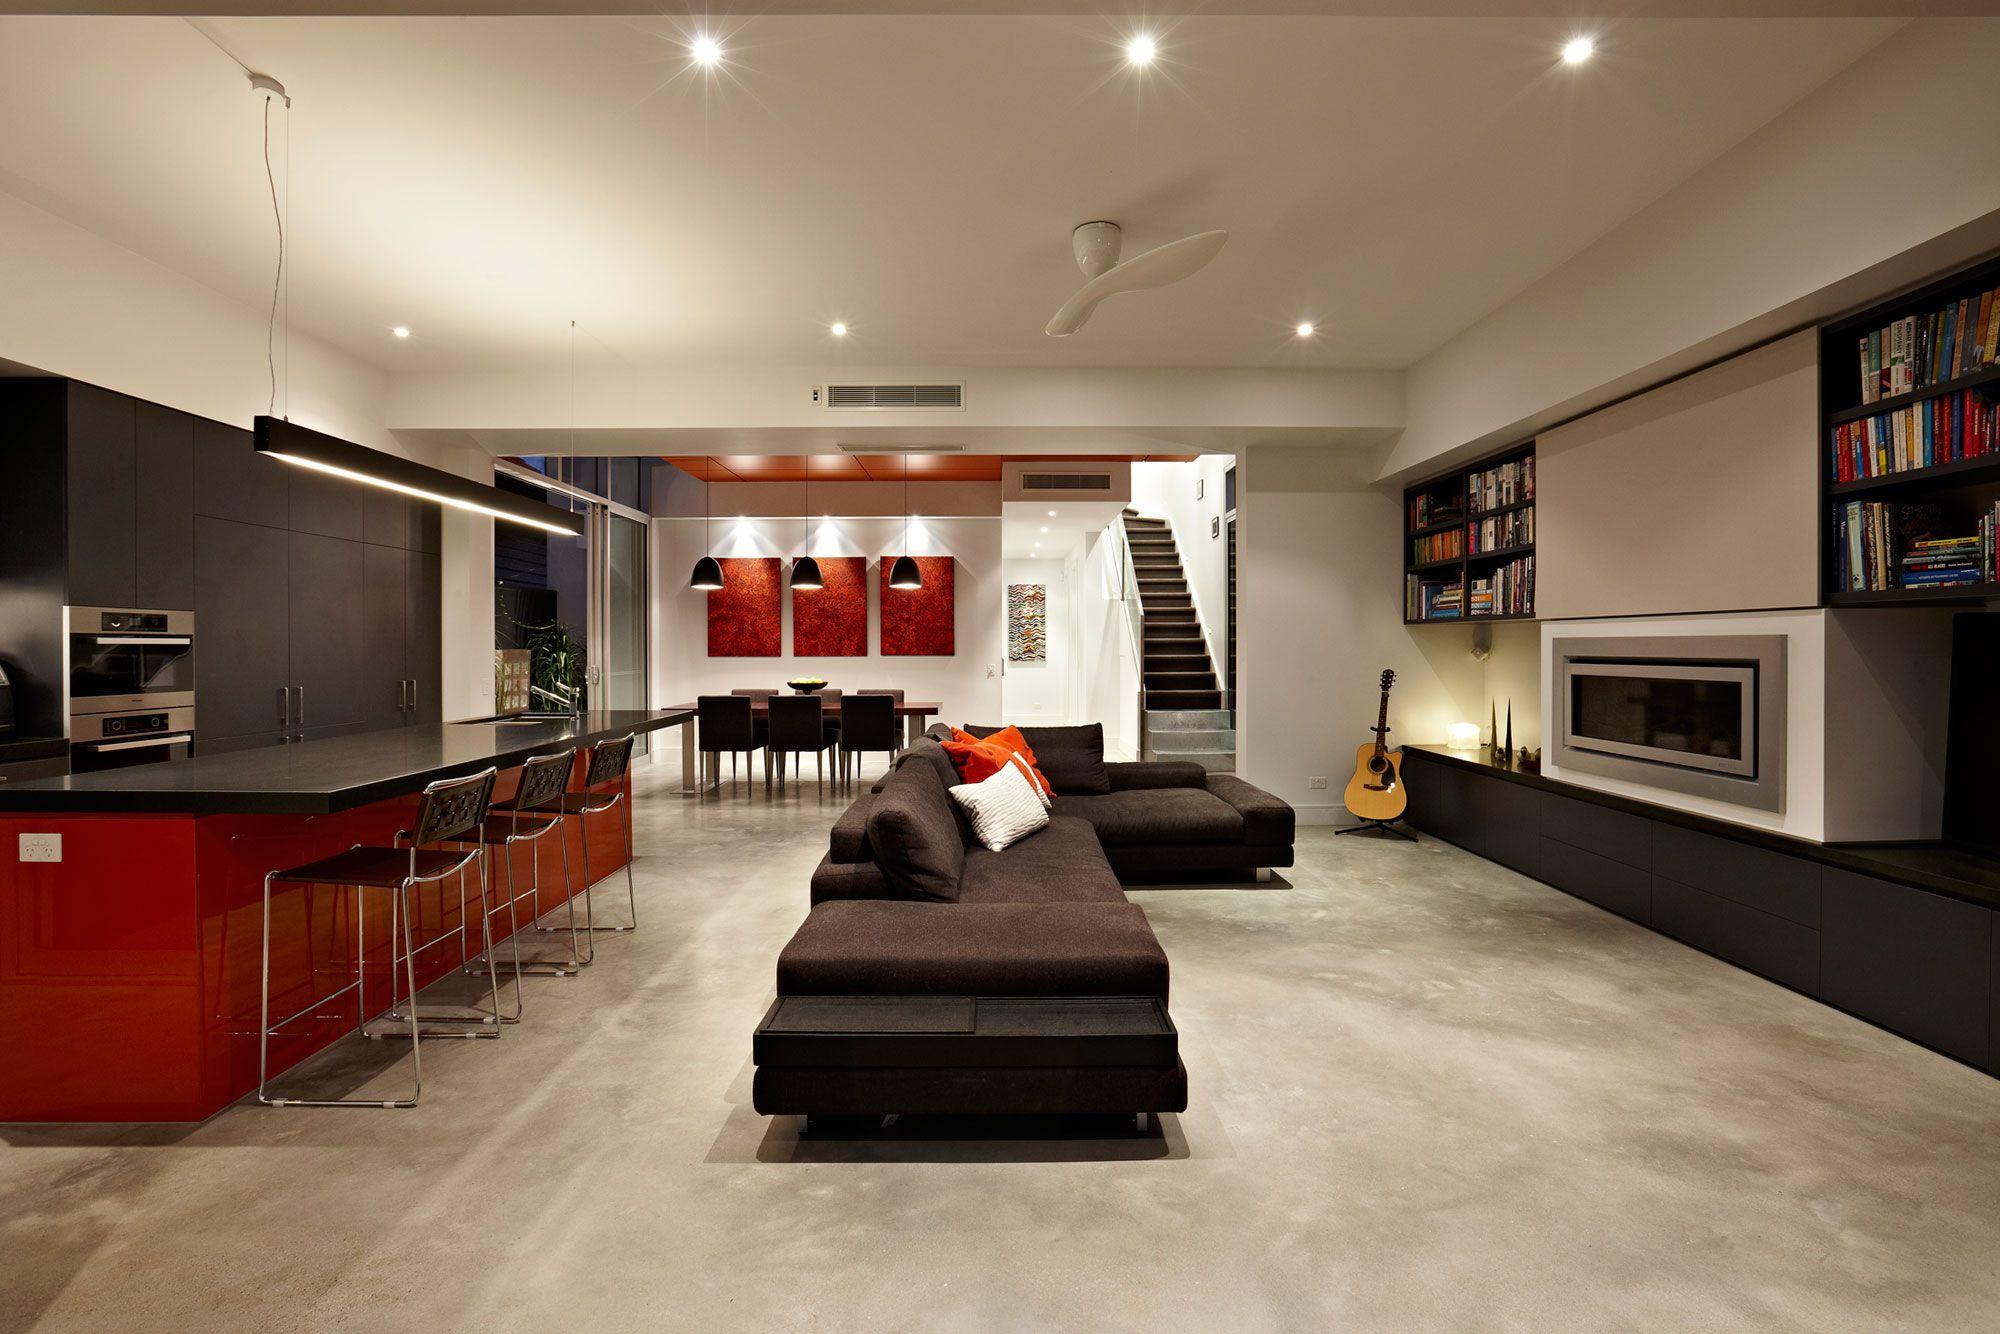 Diseño de casa moderna de dos plantas Planos   Construye ... on Interiores De Casas Modernas  id=46238